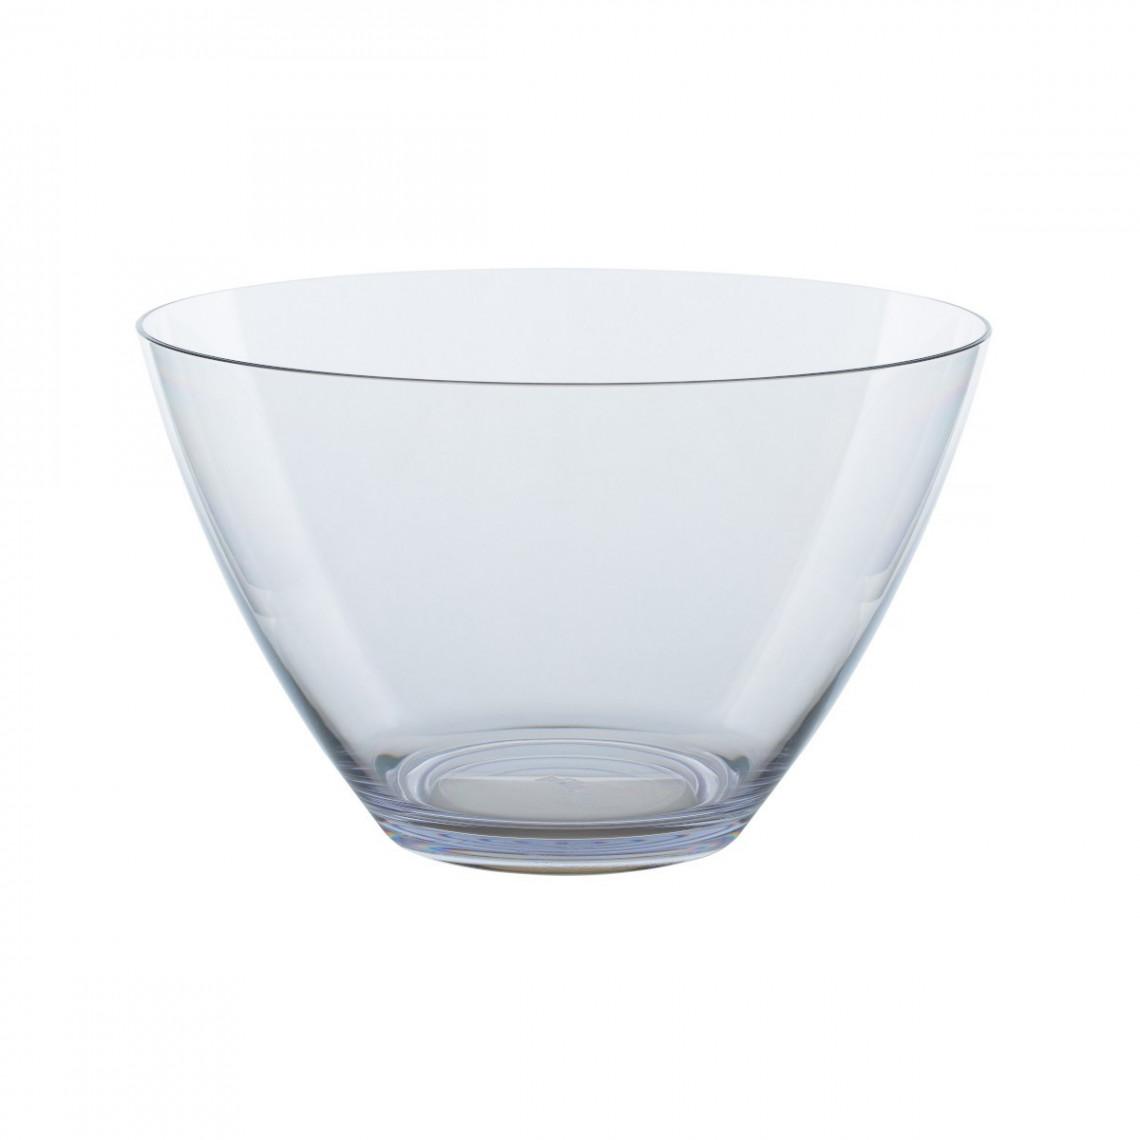 Vasque plexi transparent pour saladier Tutti Frutti